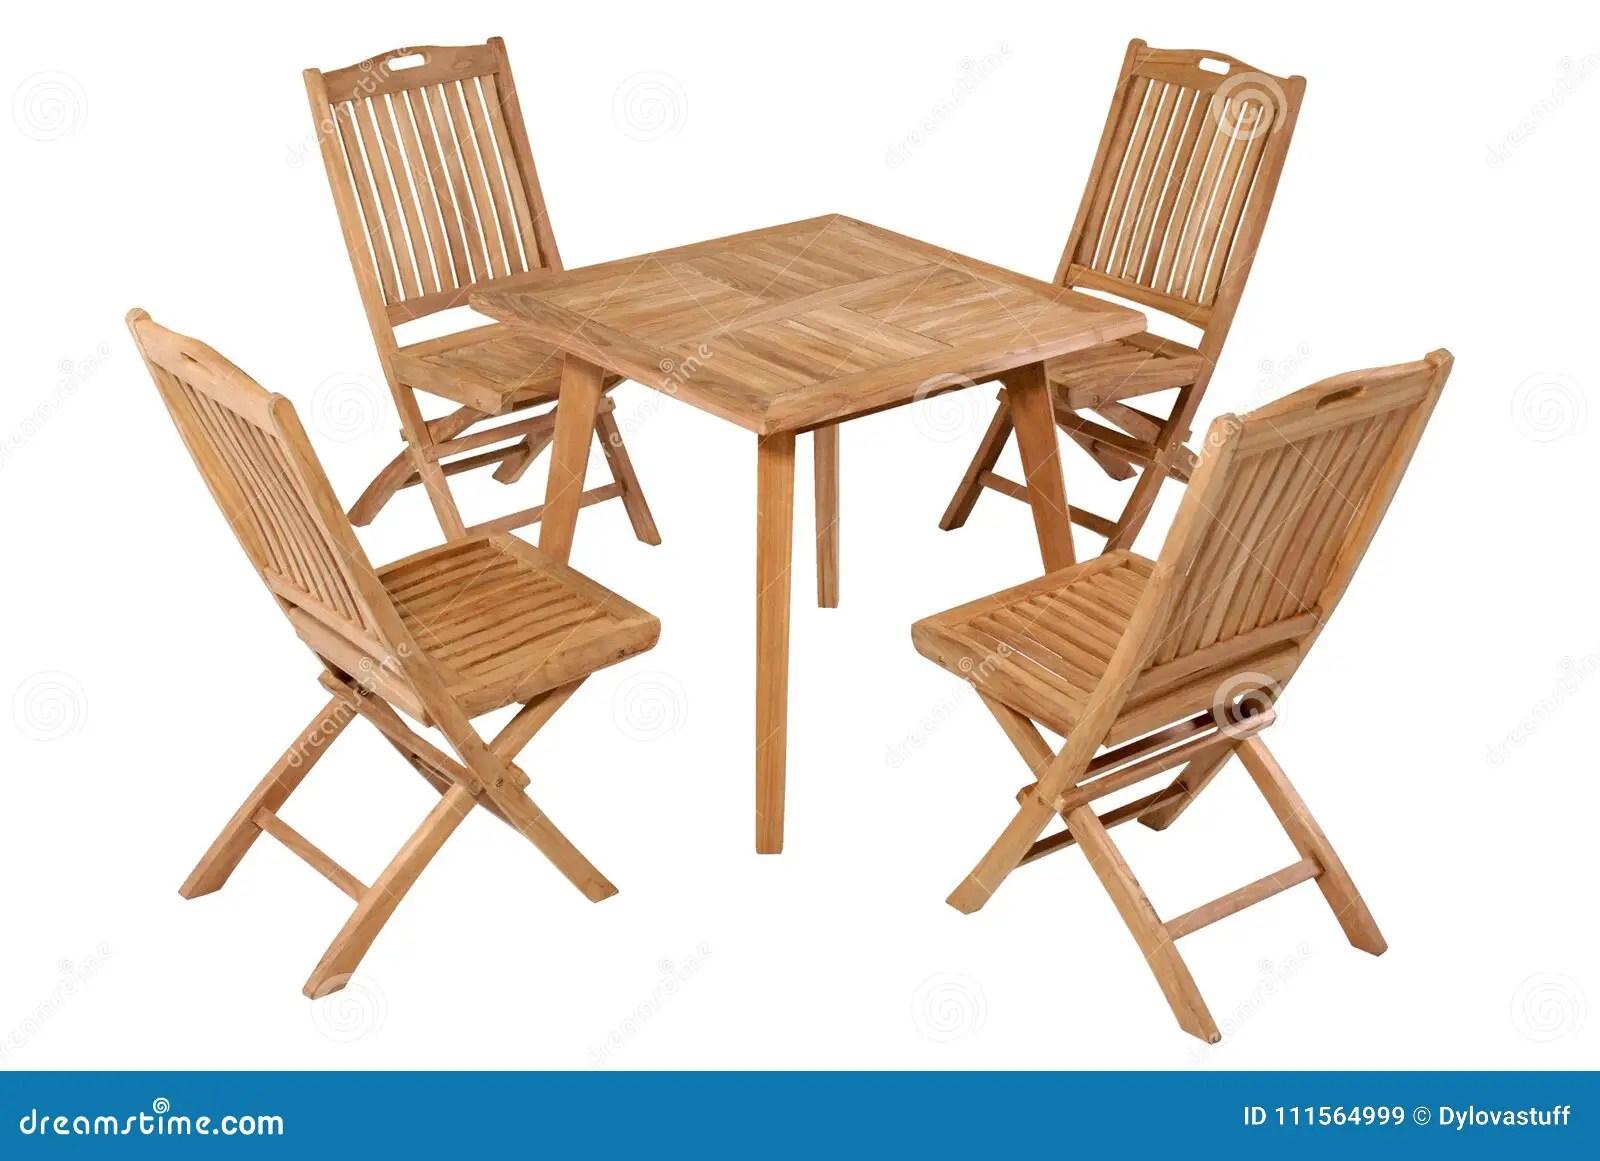 Teak Folding Table Garden Furniture Garden Furniture Set Stock Image Image Of Furniture Isolated 111564999